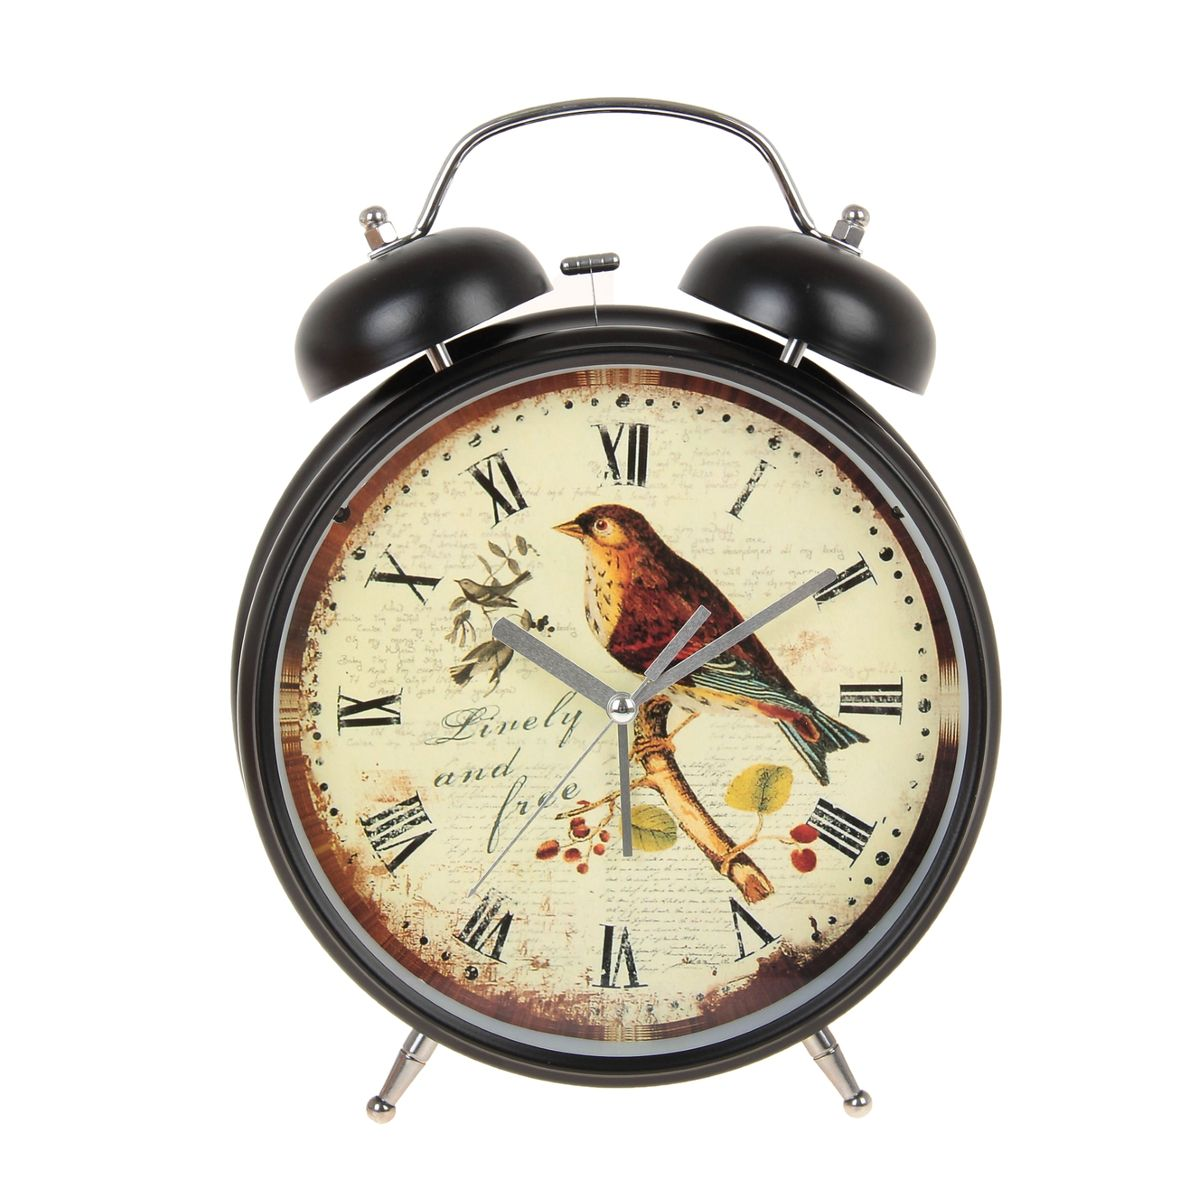 Часы-будильник Sima-land Linely And Free, цвет: черный, светло-желтый, диаметр 20 см часы будильник sima land жду встречи